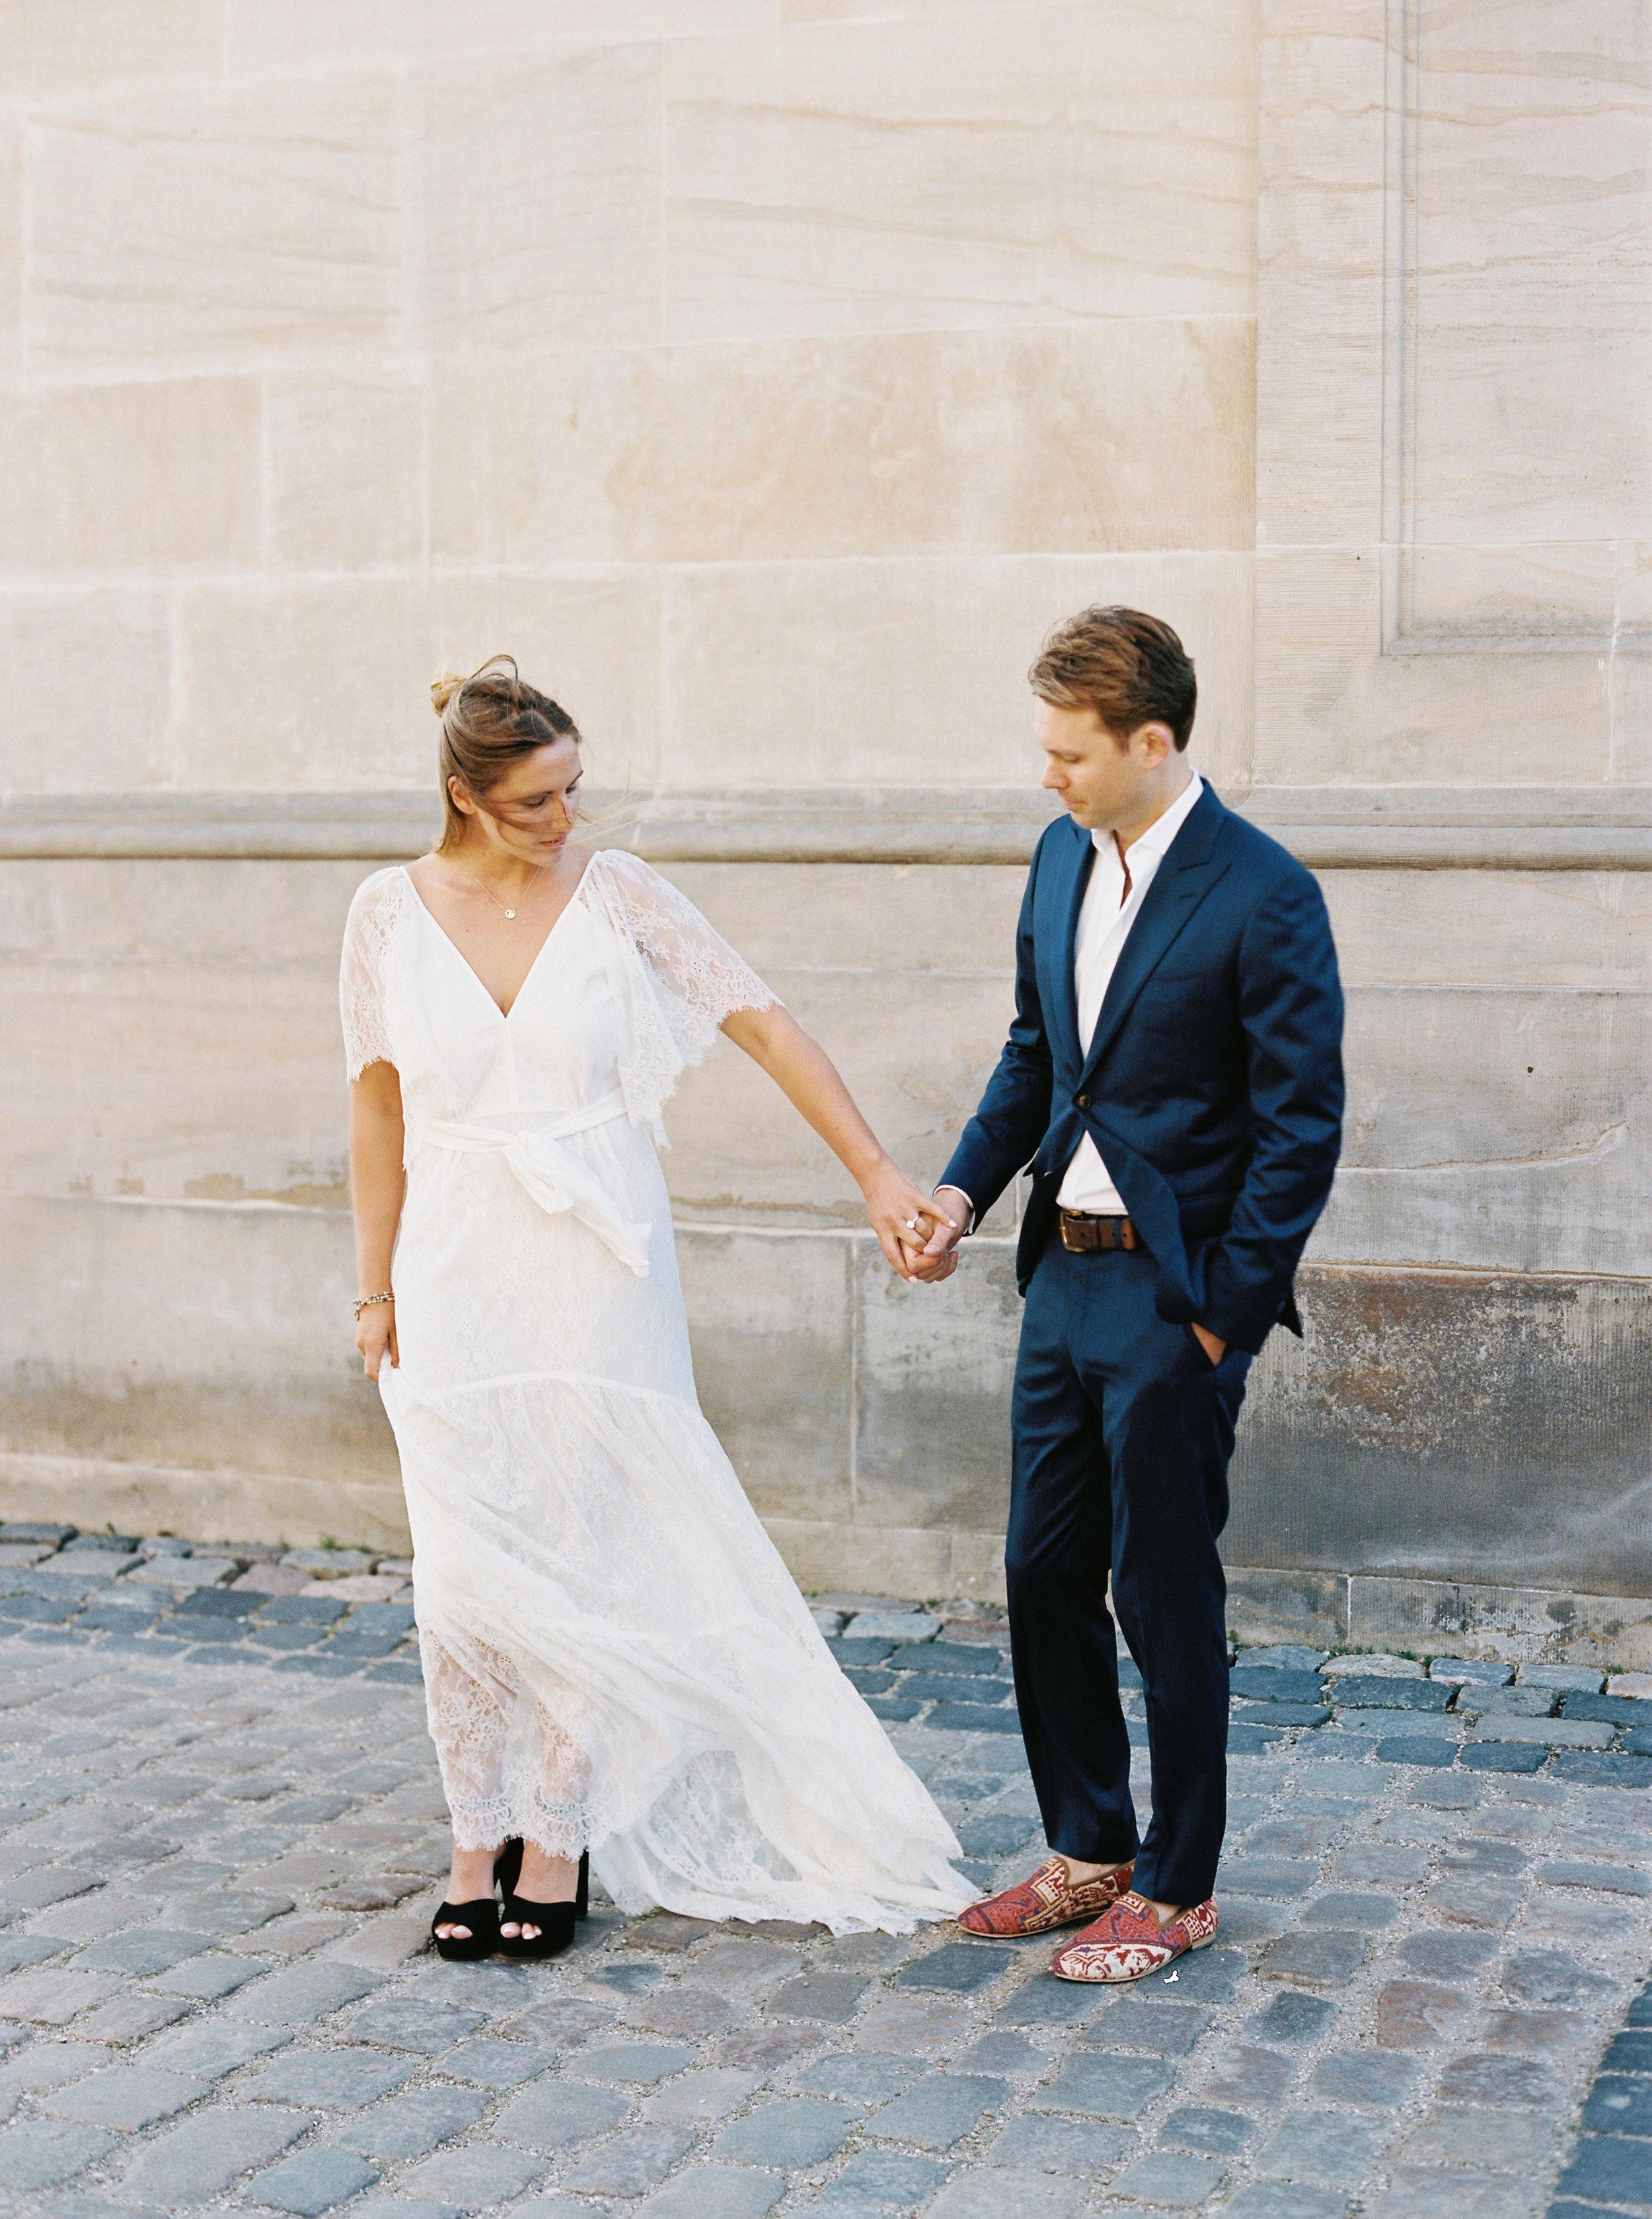 Kyle John l Fine Art Wedding Photography l Chicago, Copenhagen, California, New York, Destination l Blog l Alexis and Zach_Copenhagen Part 2_24